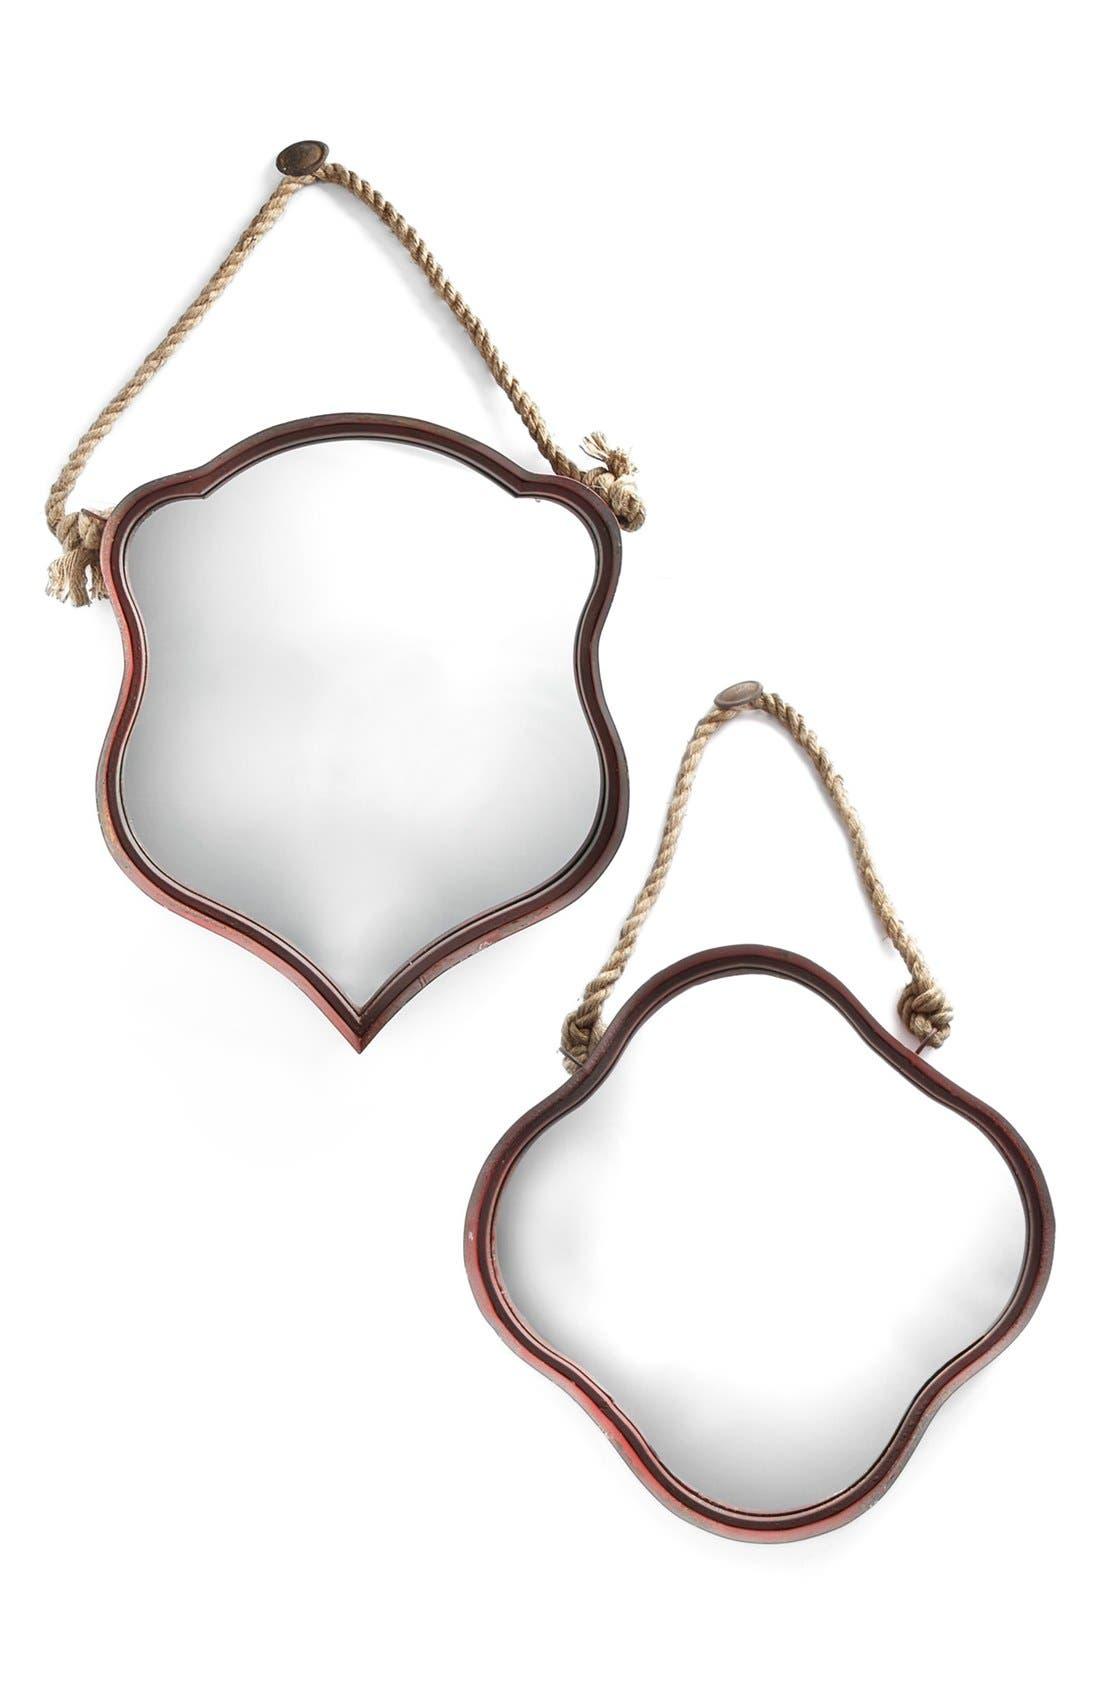 Alternate Image 1 Selected - Metal Frame Mirror Set